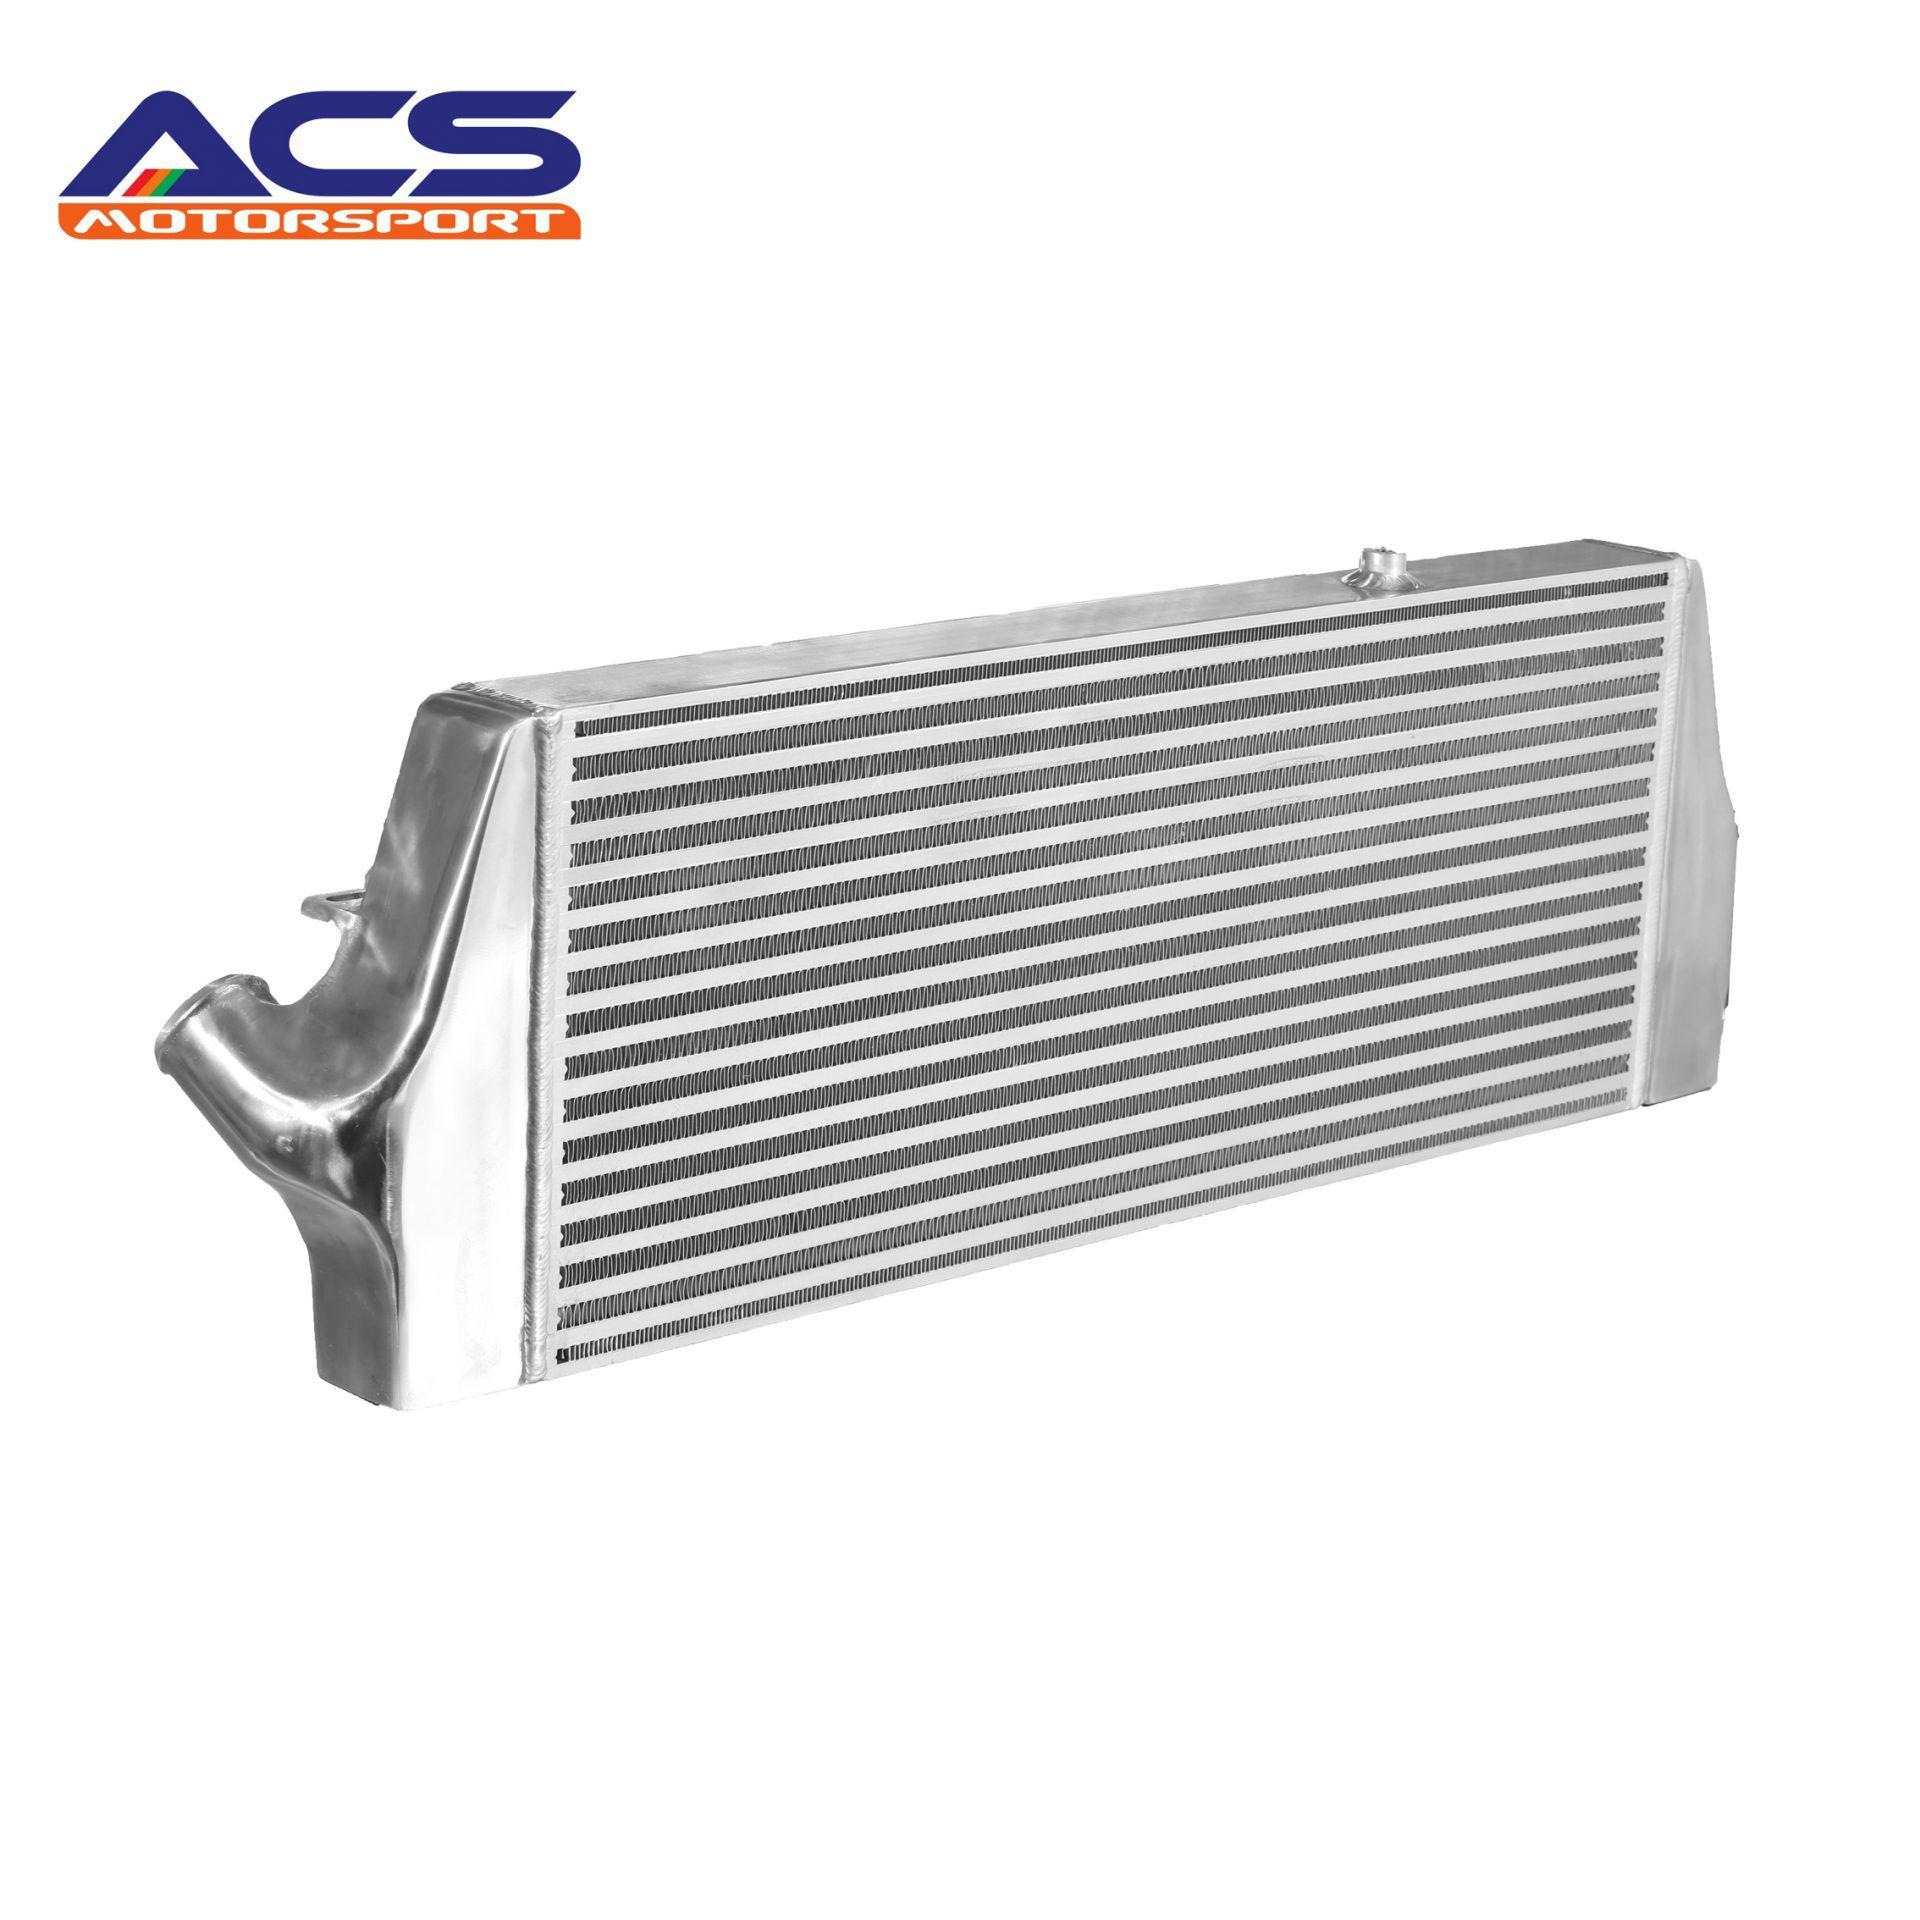 ACS Motorsport HighPerformance Car Parts Supplier from